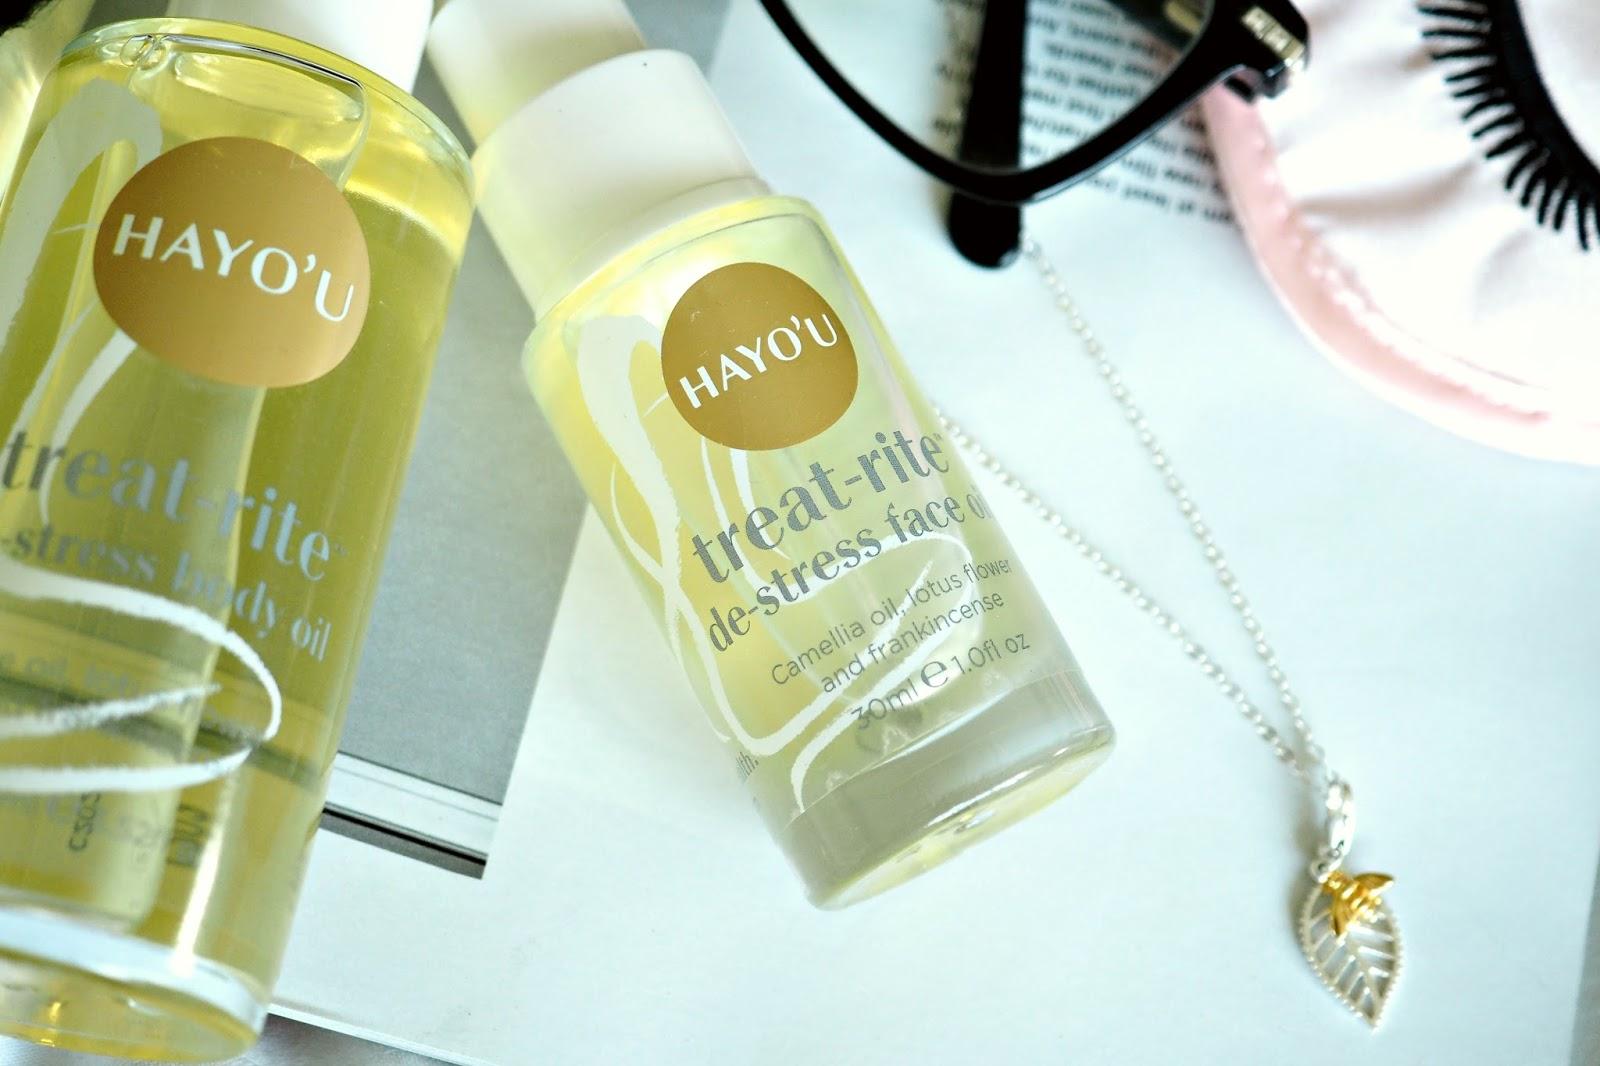 Hayo'u treat-rite de=stress facial oil